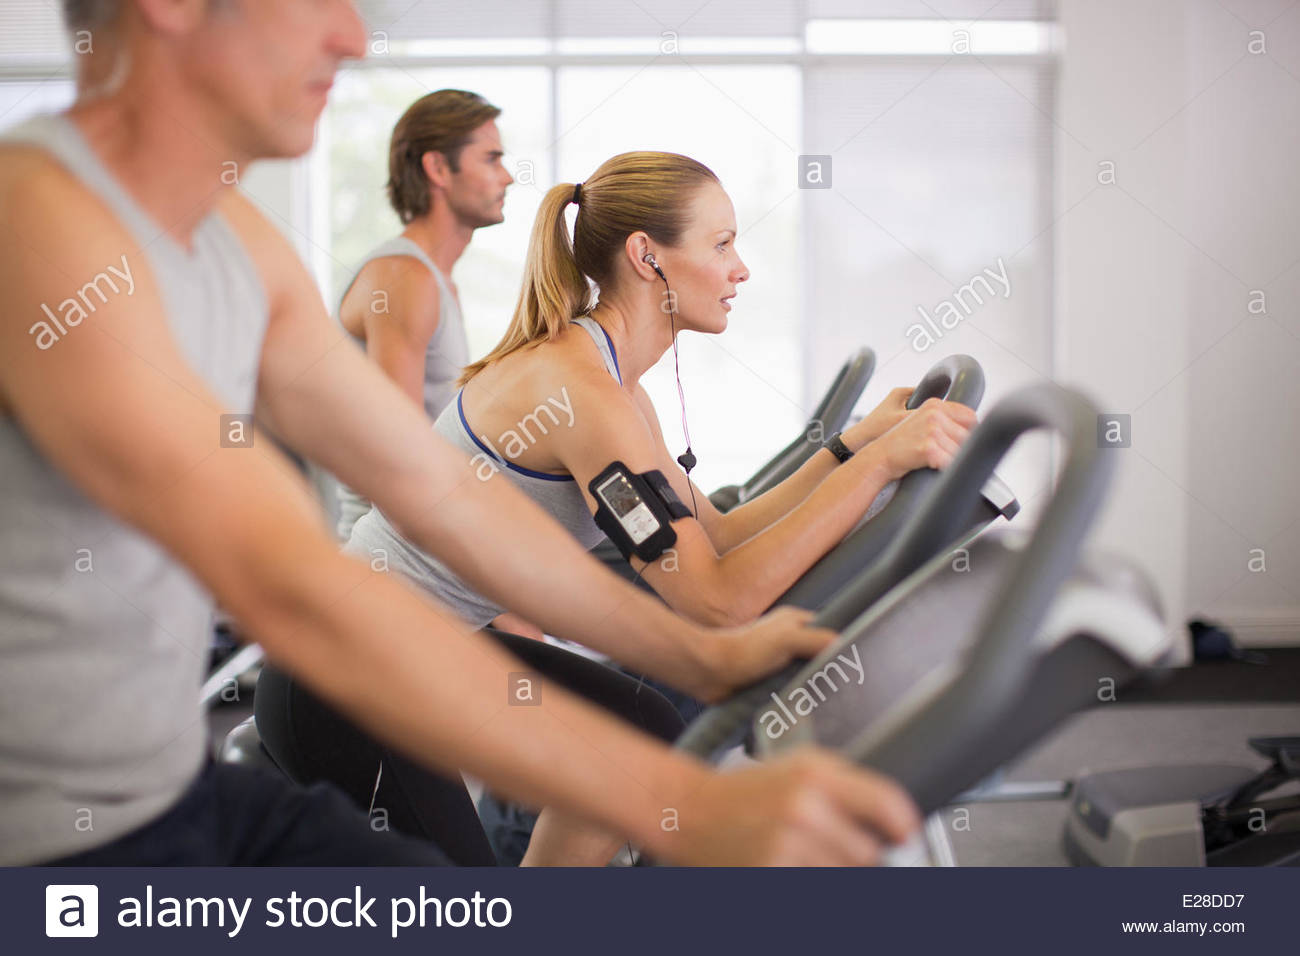 Three people on exercise bikes in gymnasium - Stock Image